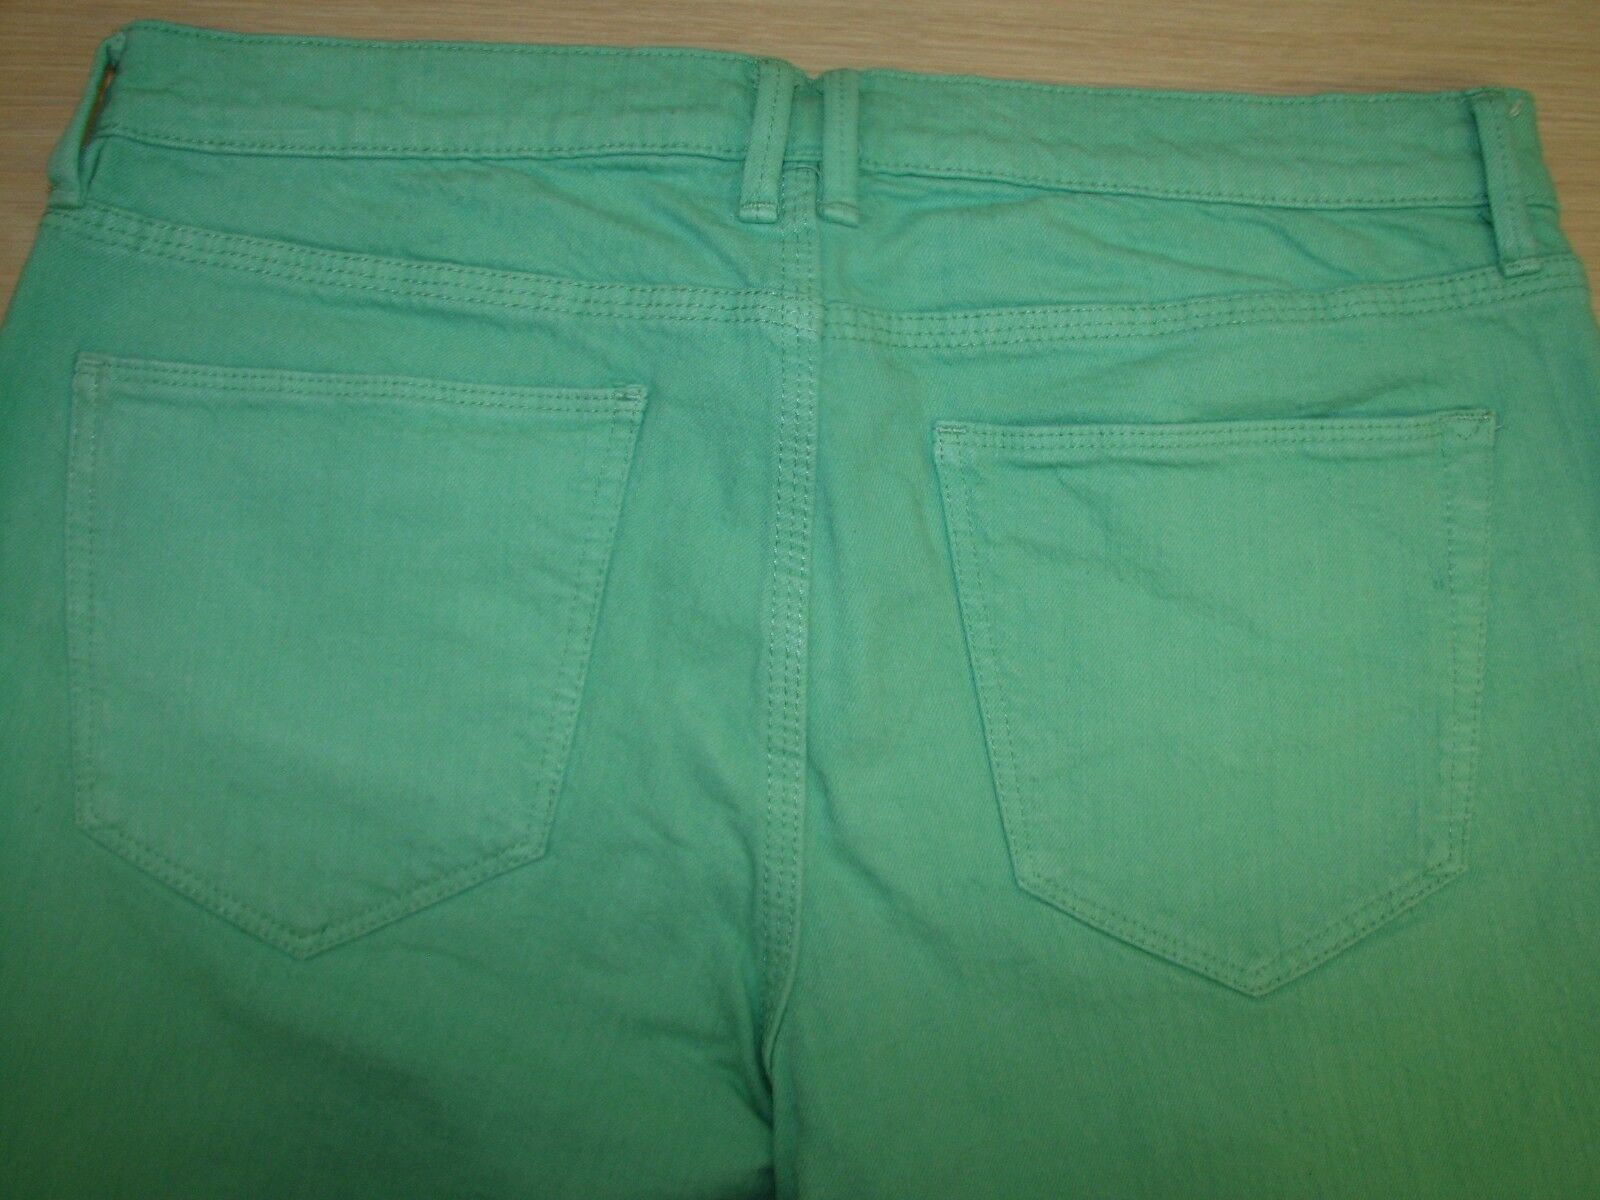 Madewell Skinny Skinny Ankle Size 29 Women's Denim Green Jeans